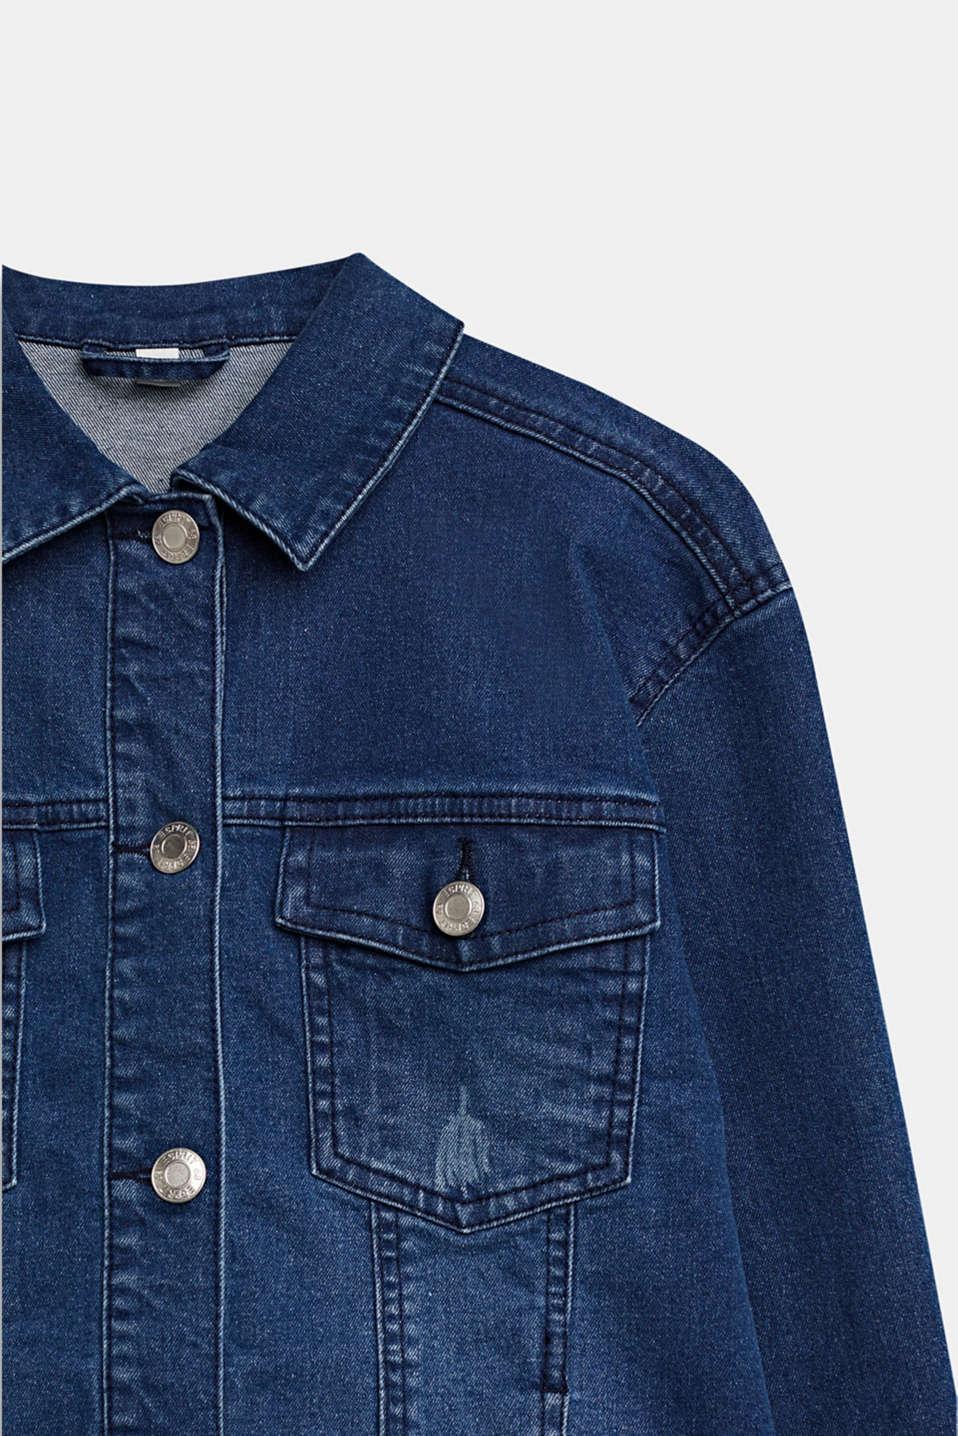 Denim jacket with a statement print, LCMEDIUM WASH DE, detail image number 2